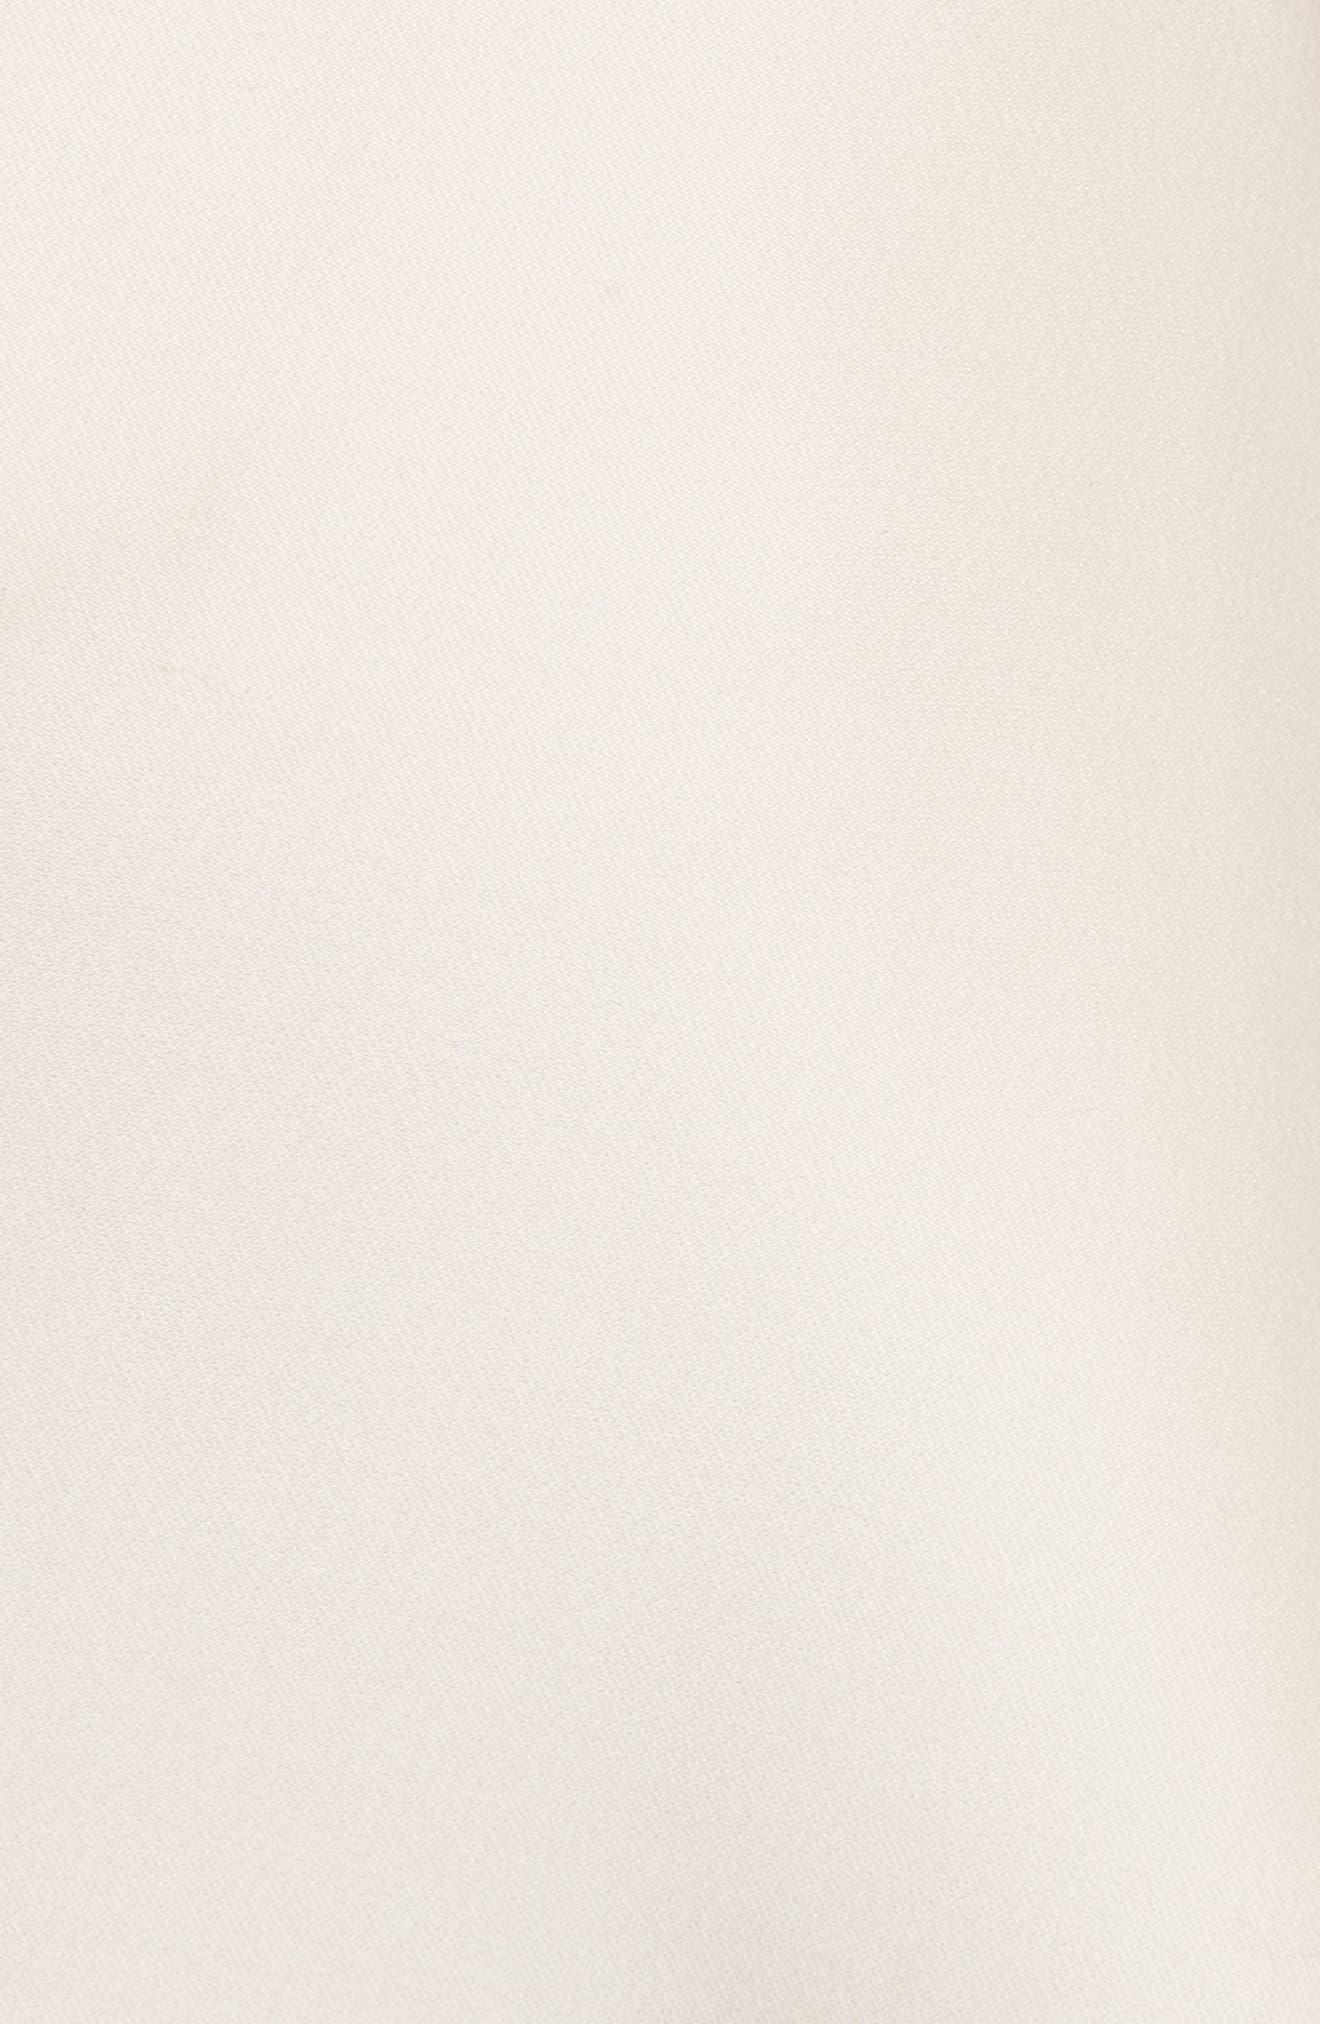 Duncan Strapless High/Low Peplum Top,                             Alternate thumbnail 5, color,